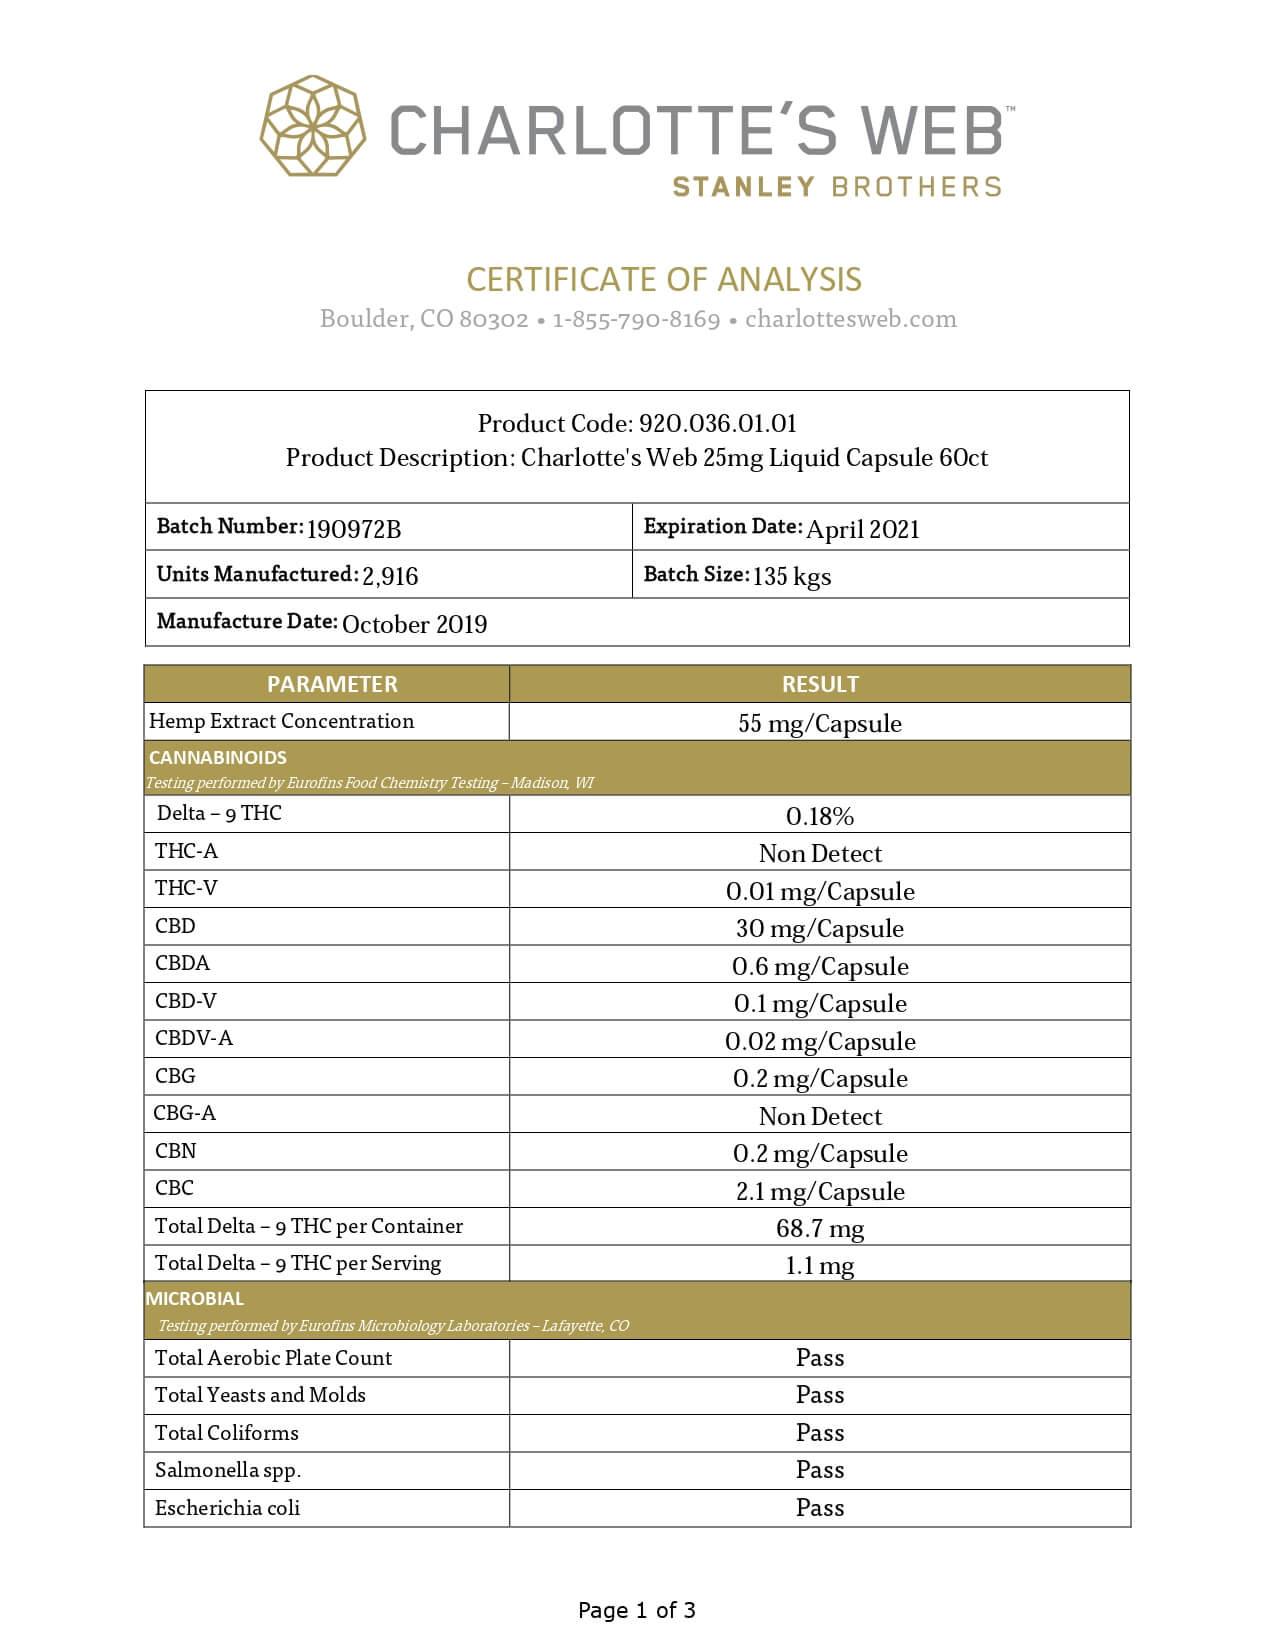 Charlottes Web CBD Capsules Full Spectrum Hemp Extract Lab Report